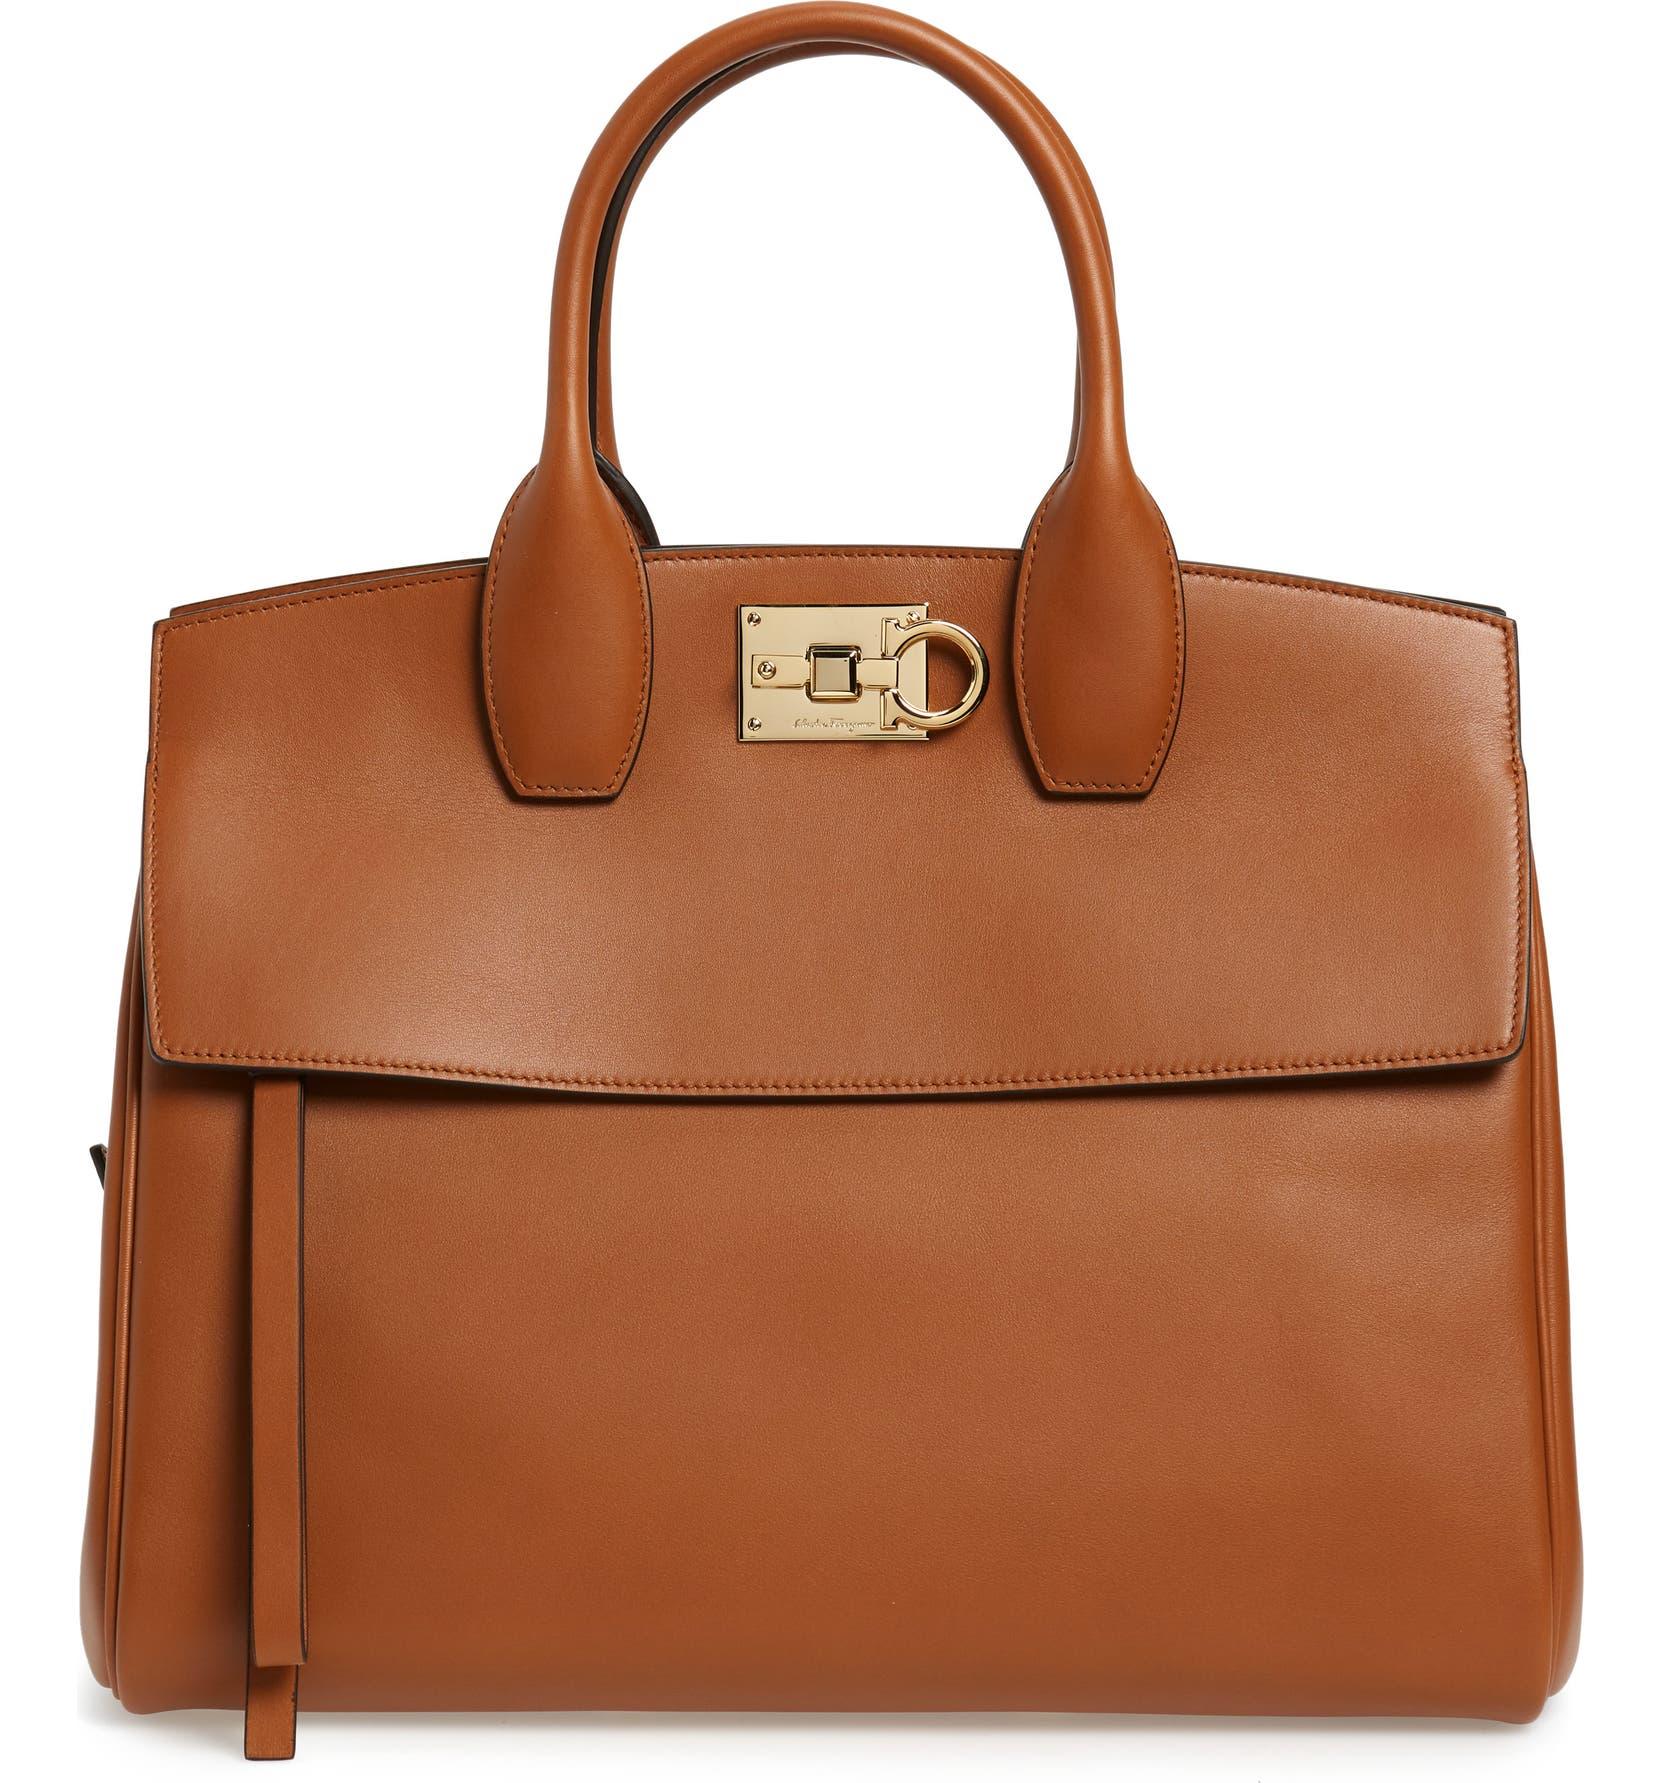 dd4fa9879394 Salvatore Ferragamo Medium The Studio Calfskin Leather Top Handle Bag